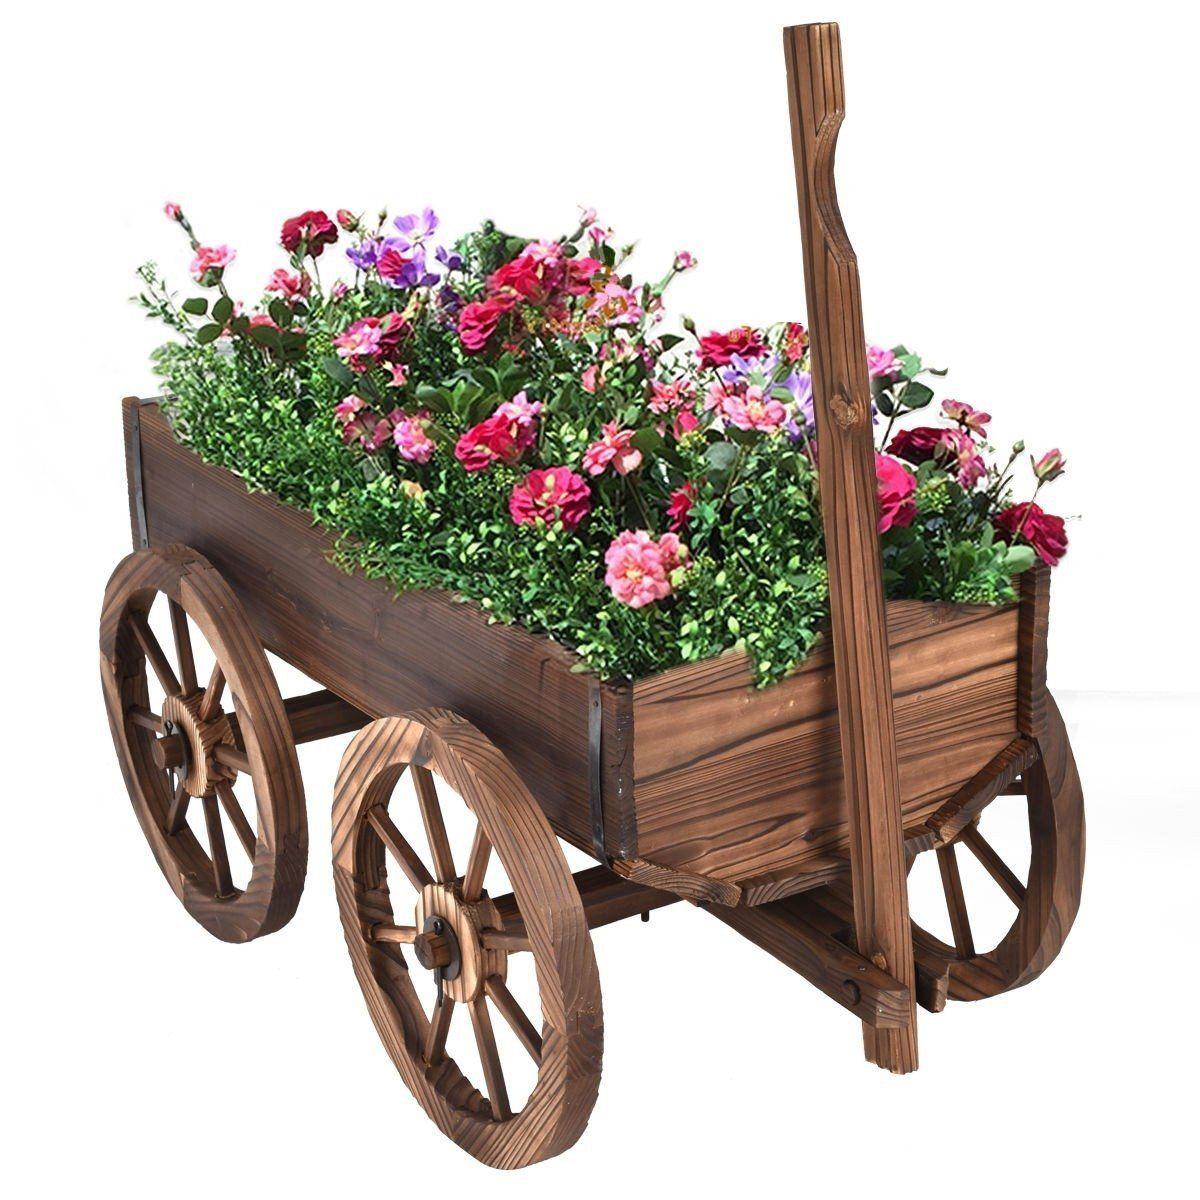 Mobile Half Barrel Solid Wood Planter Box on Wooden Wheels